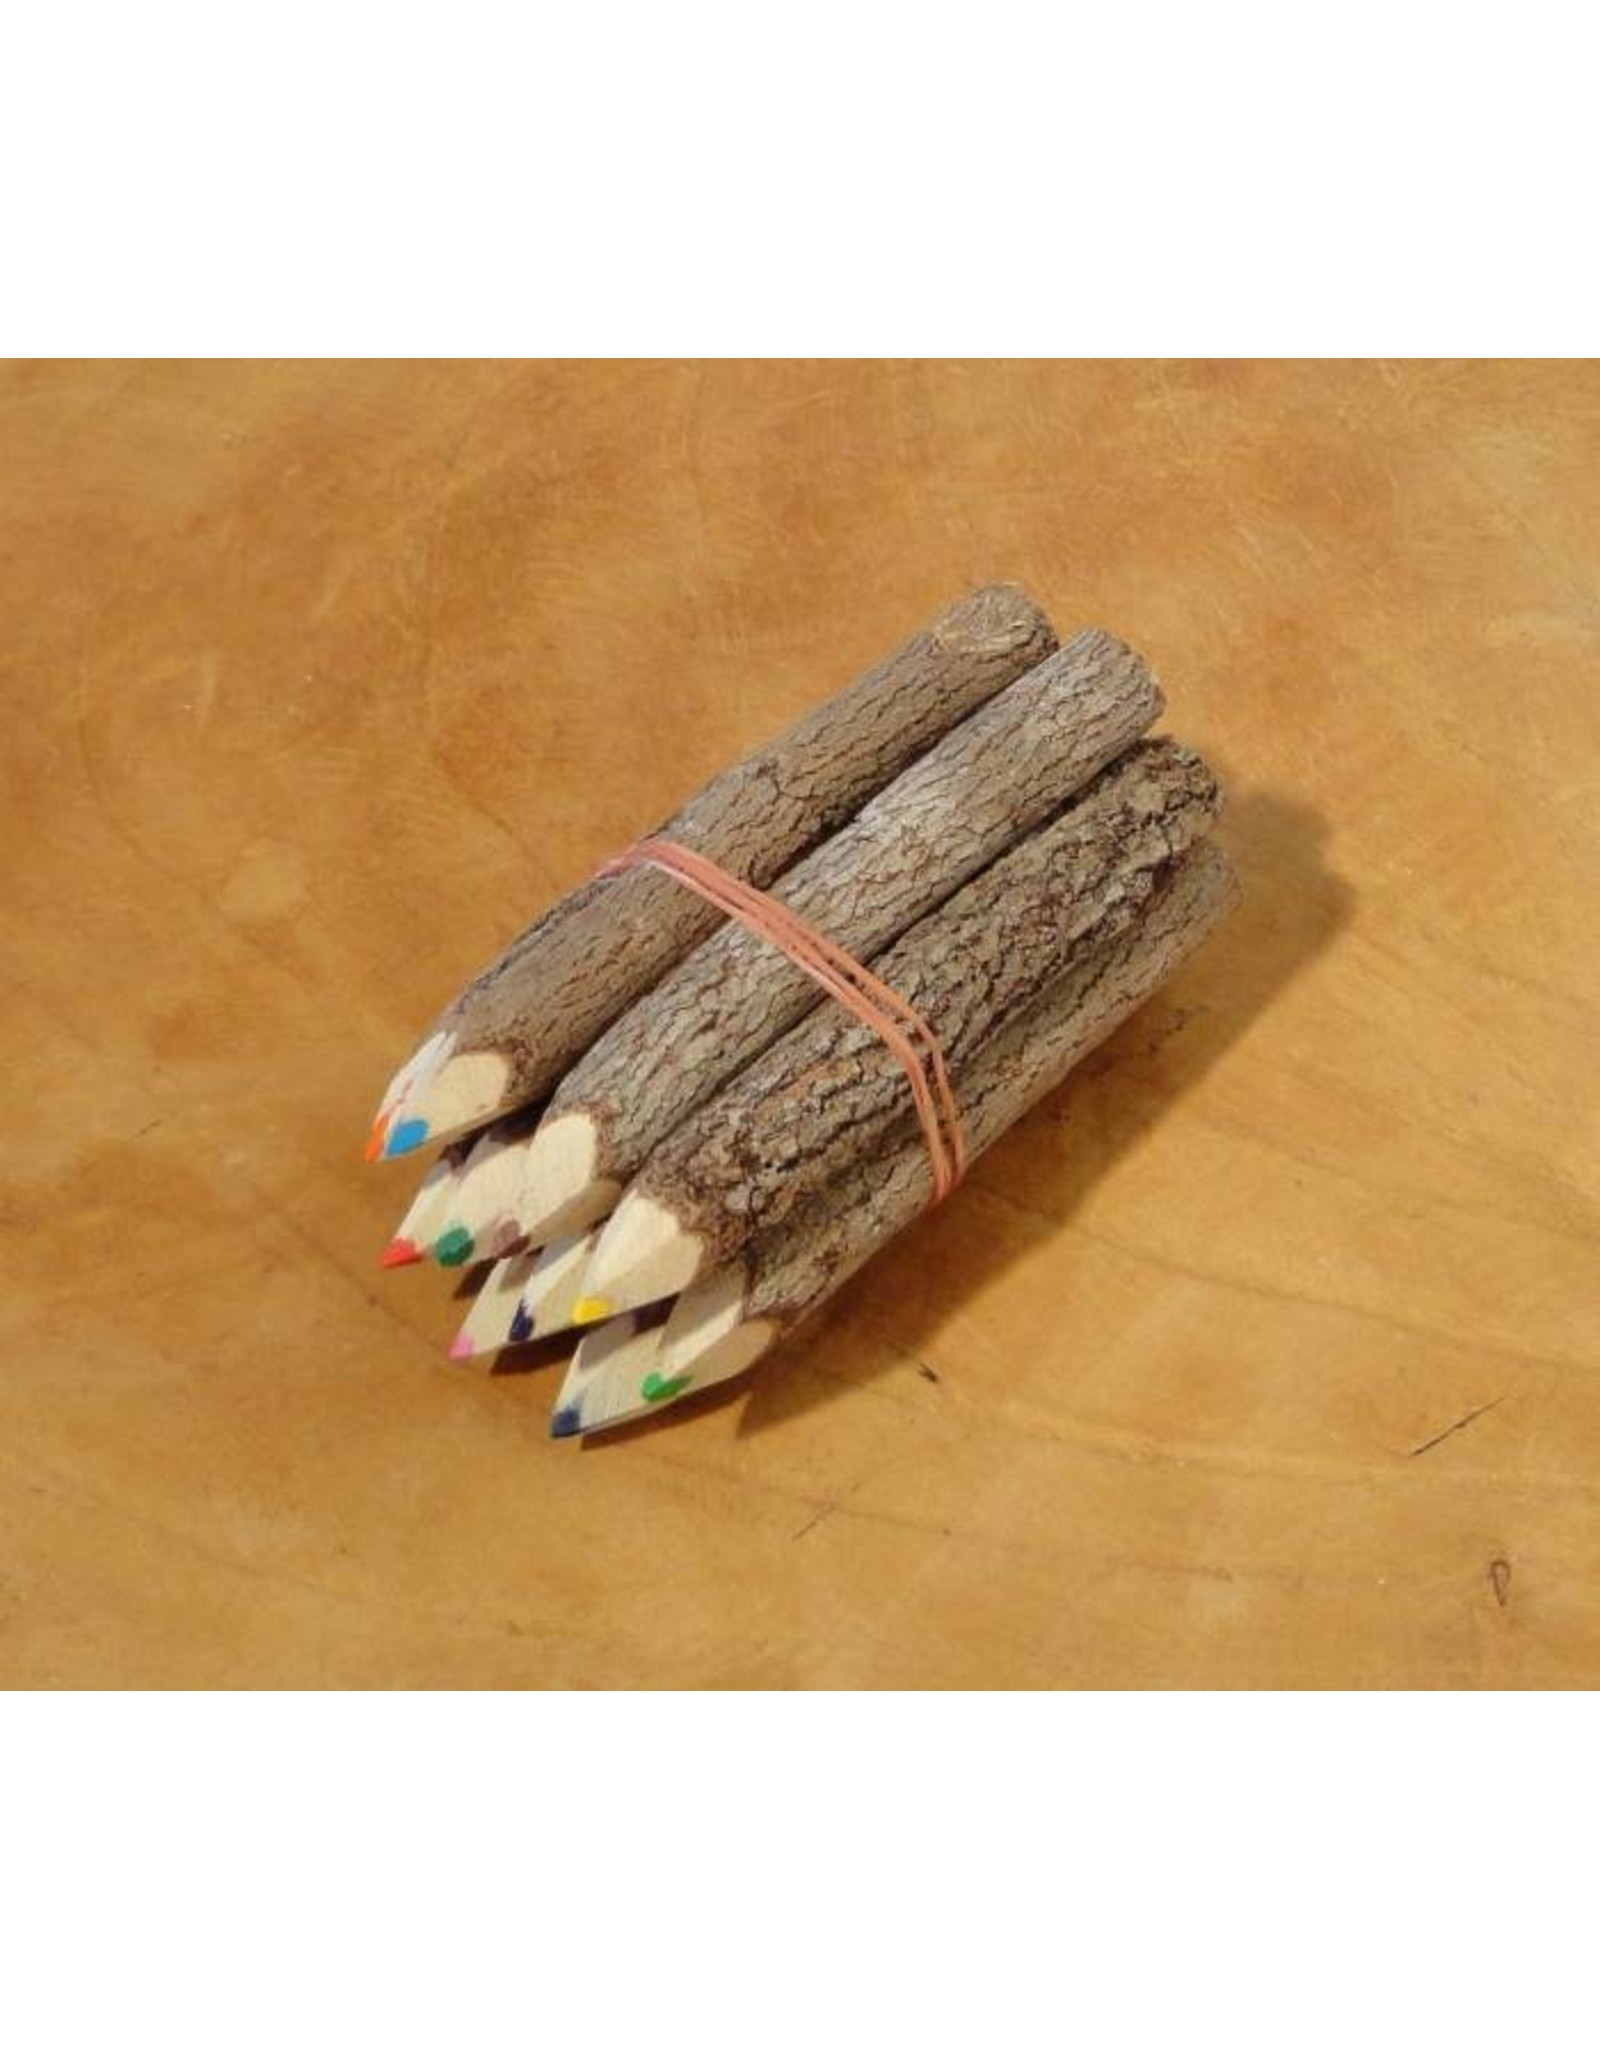 Kanika kleurpotloden set van 10 stuks 9 cm